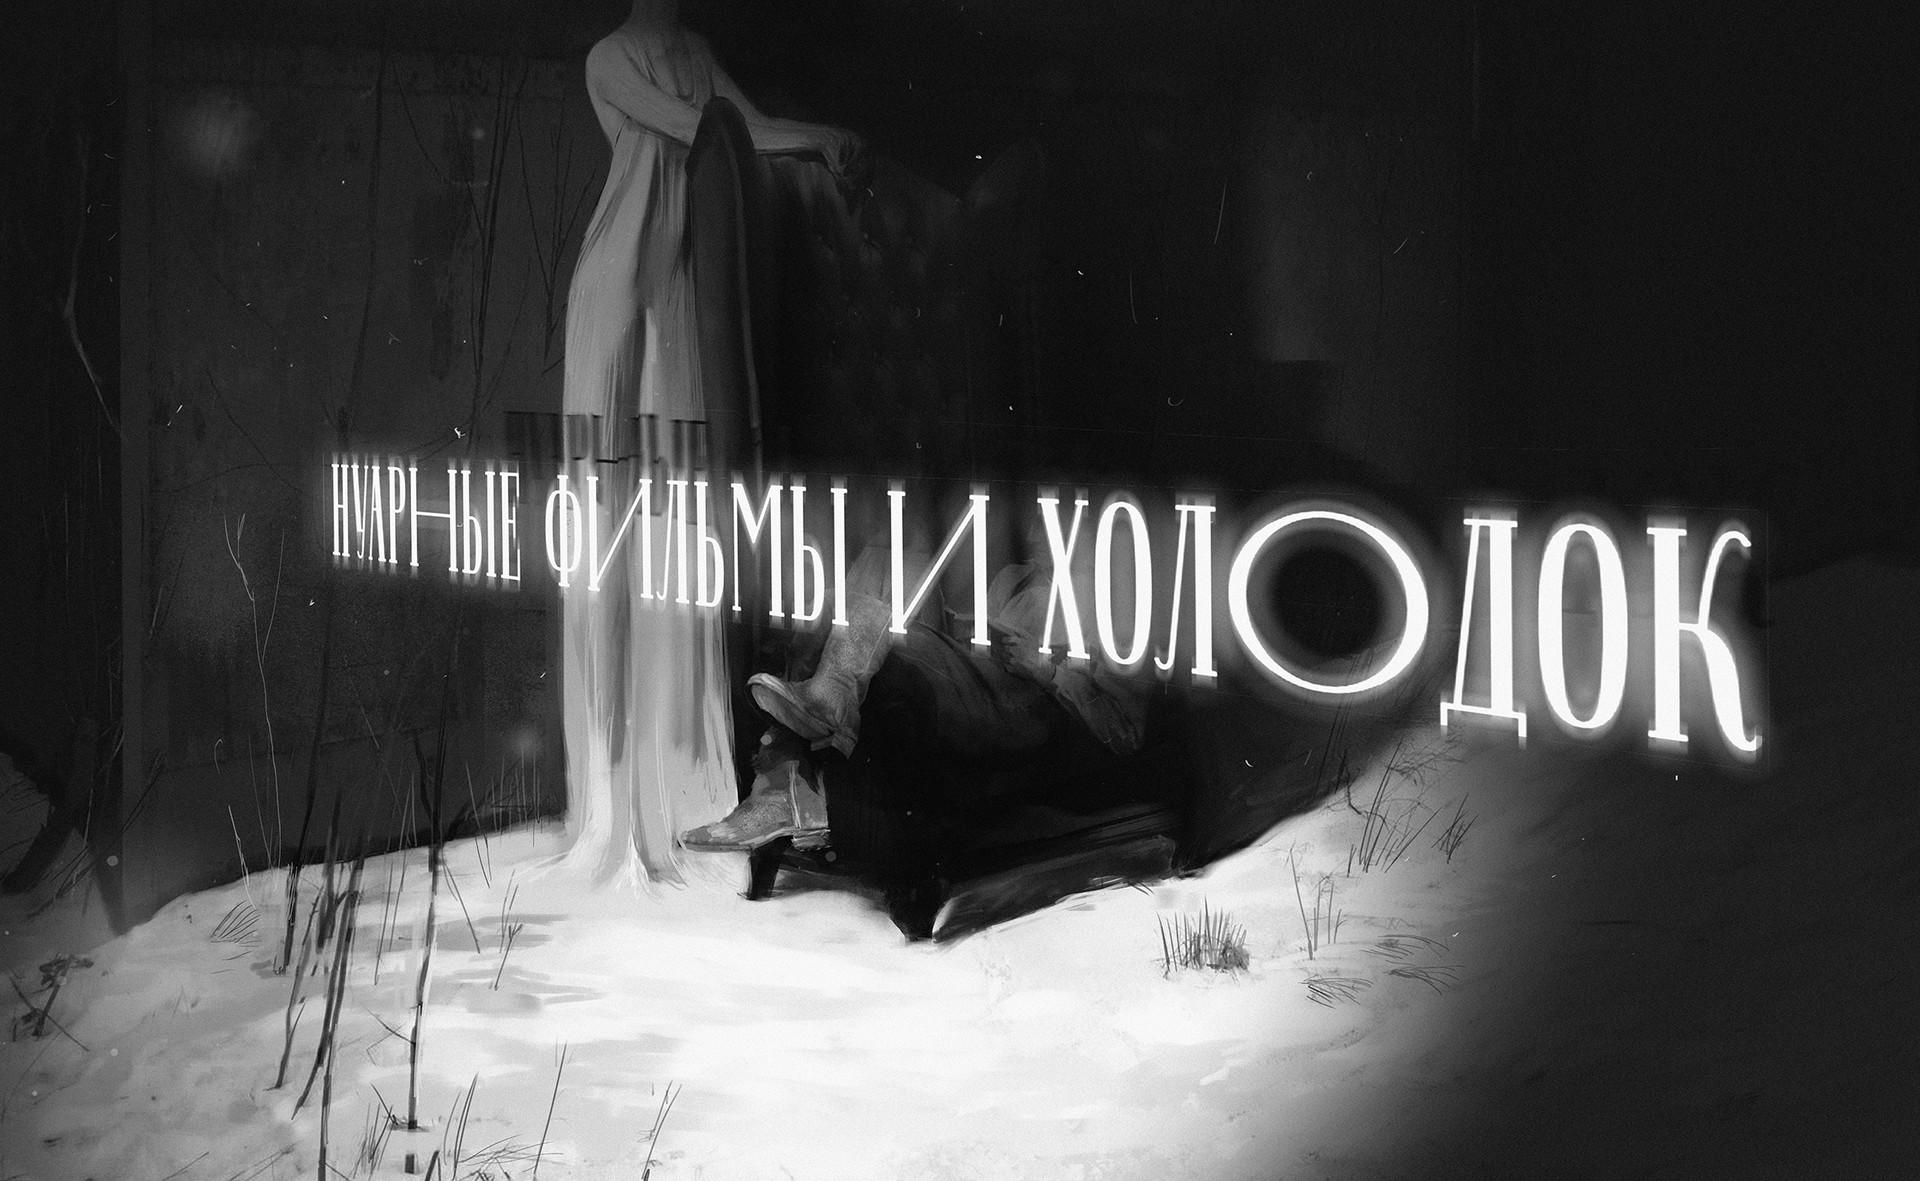 Ksenia lanina noir text cld